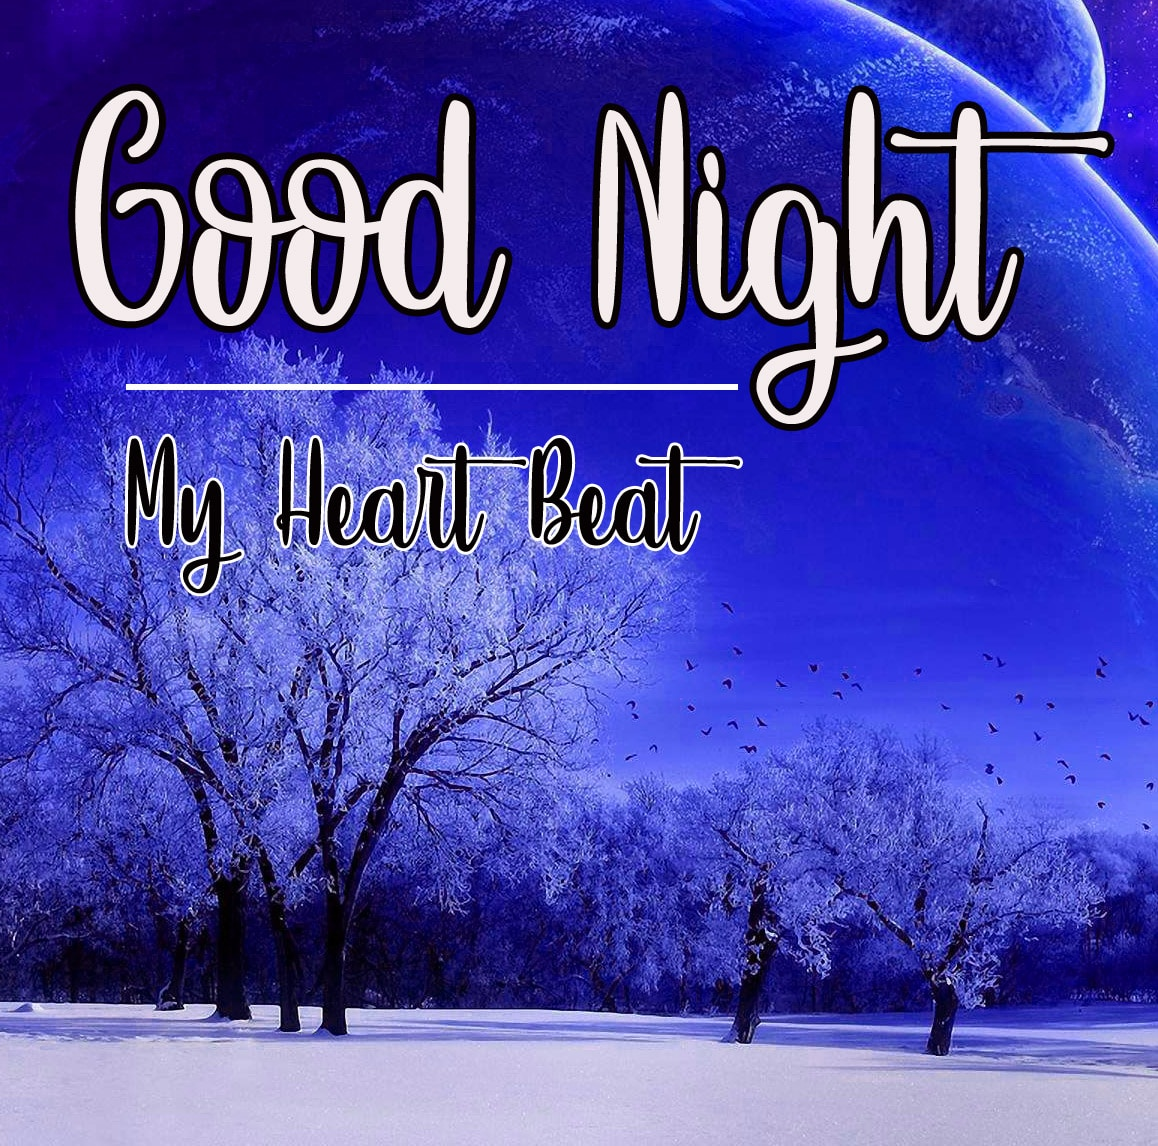 Good Night photo 1